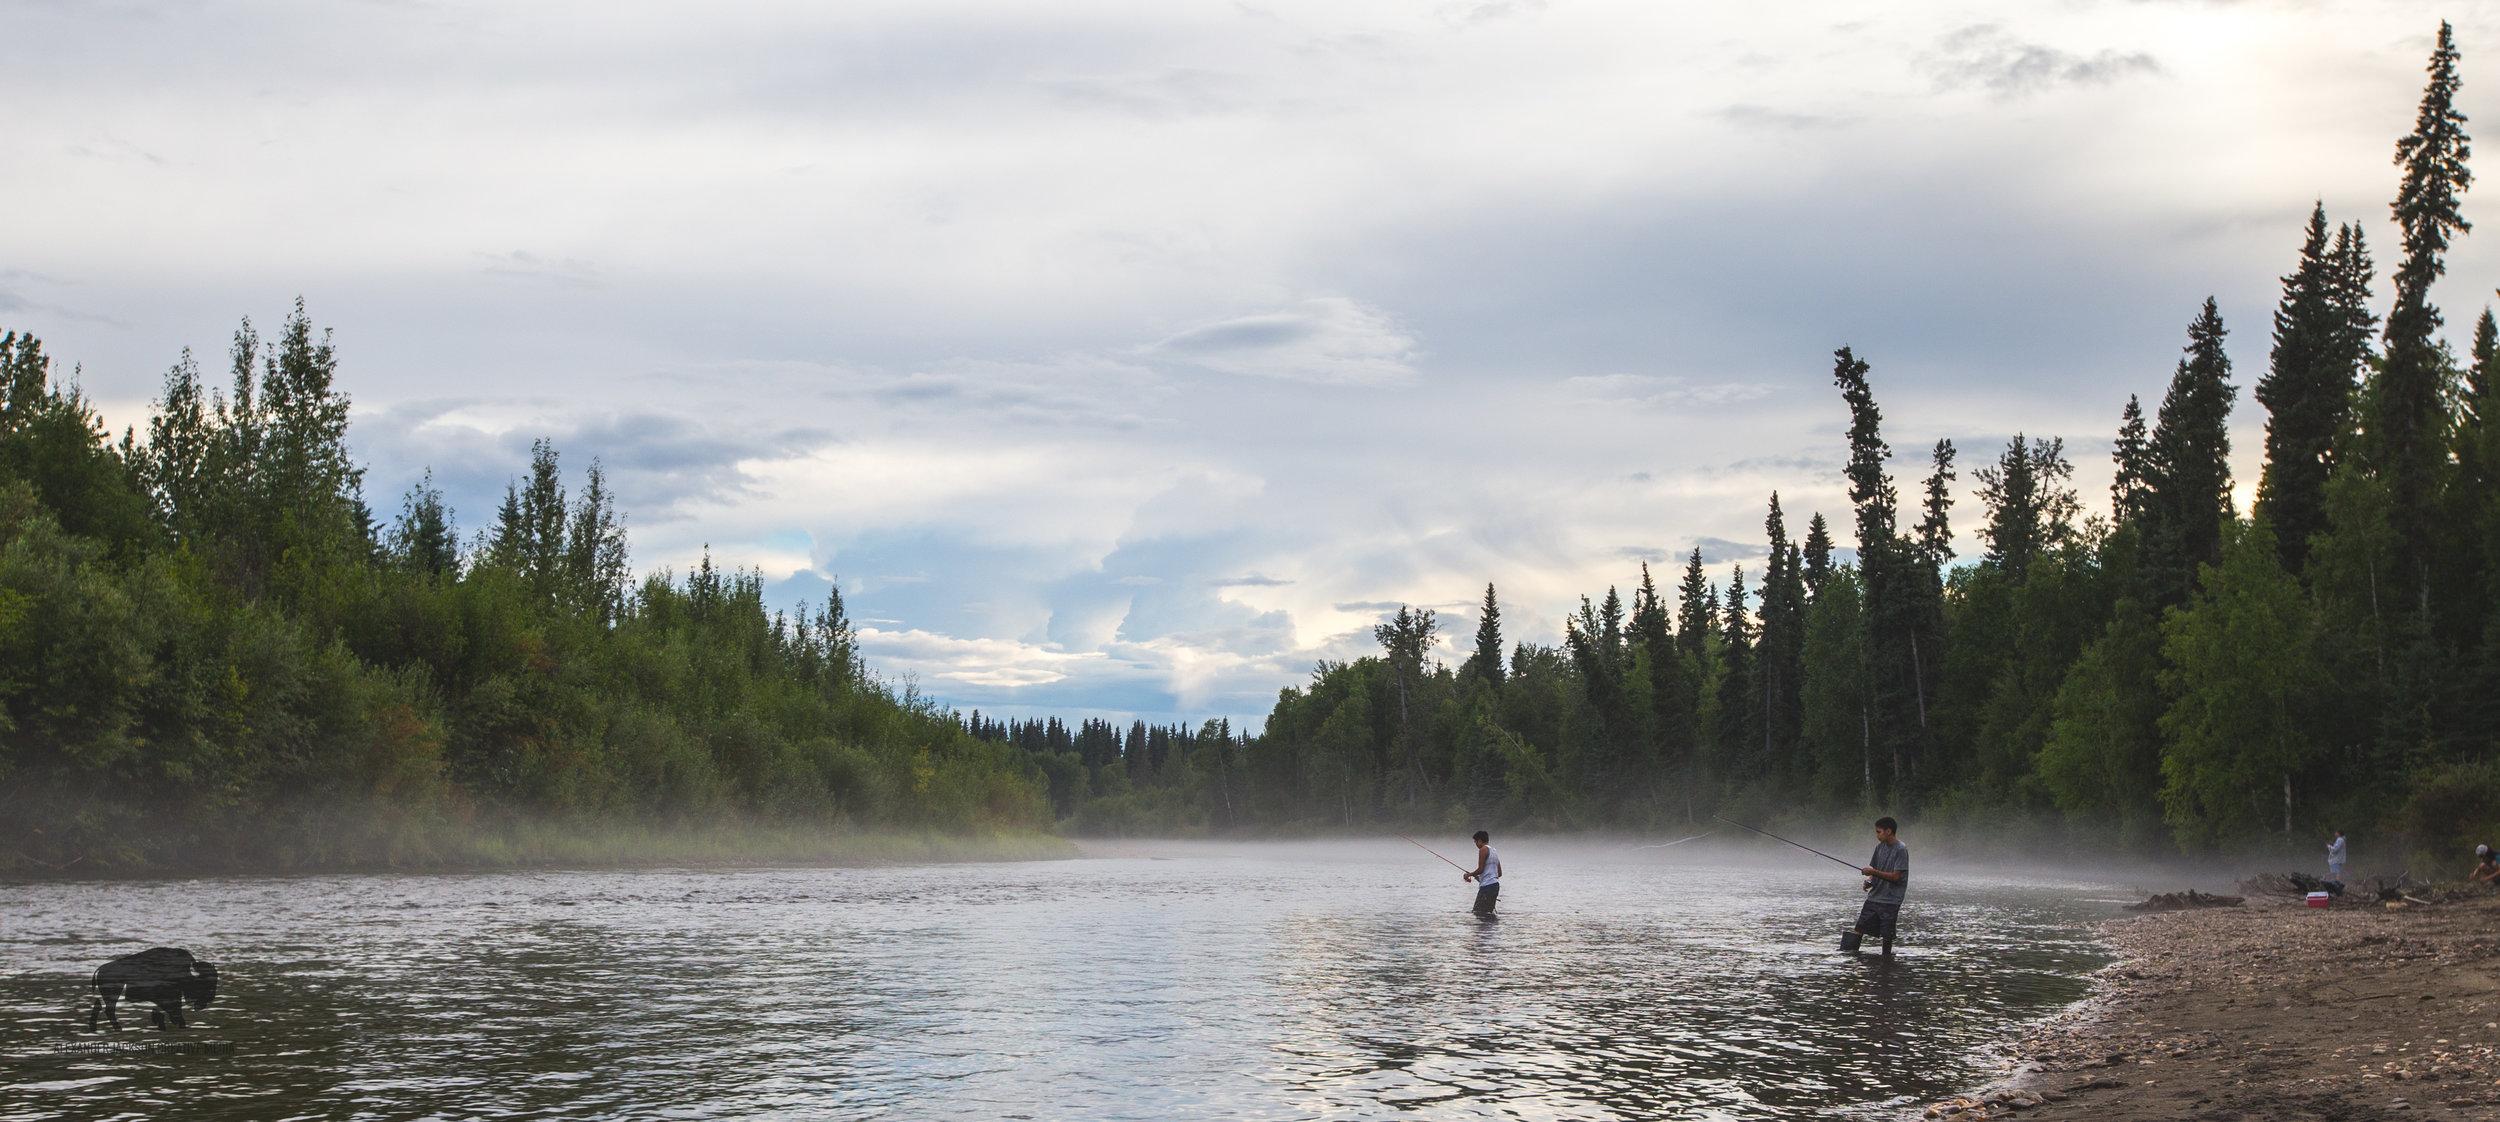 We weren't the only ones fishing.